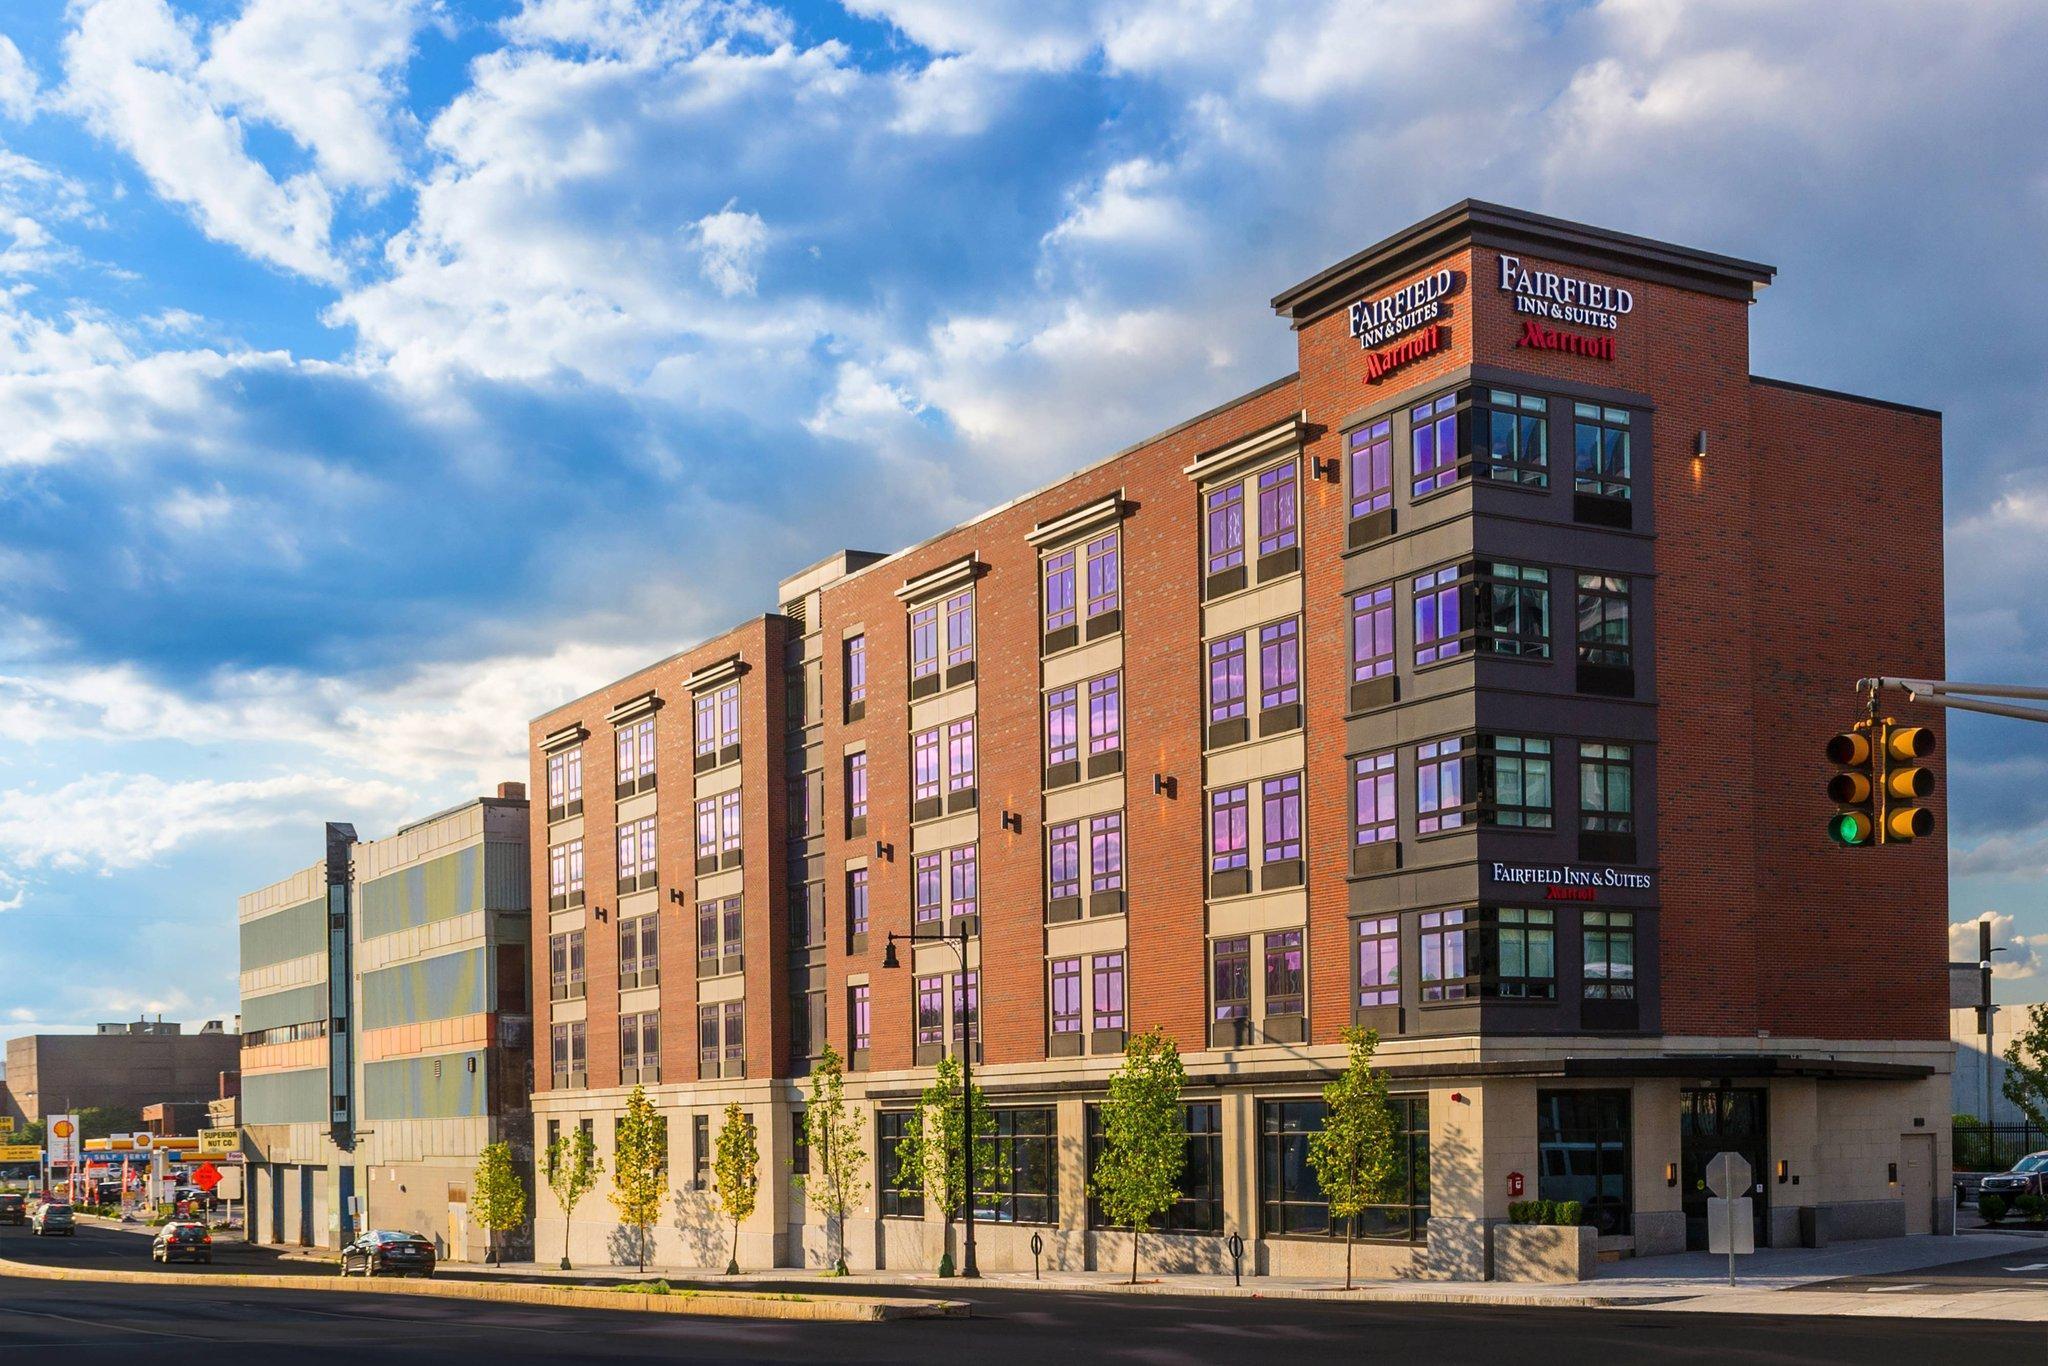 Fairfield Inn And Suites Boston Cambridge